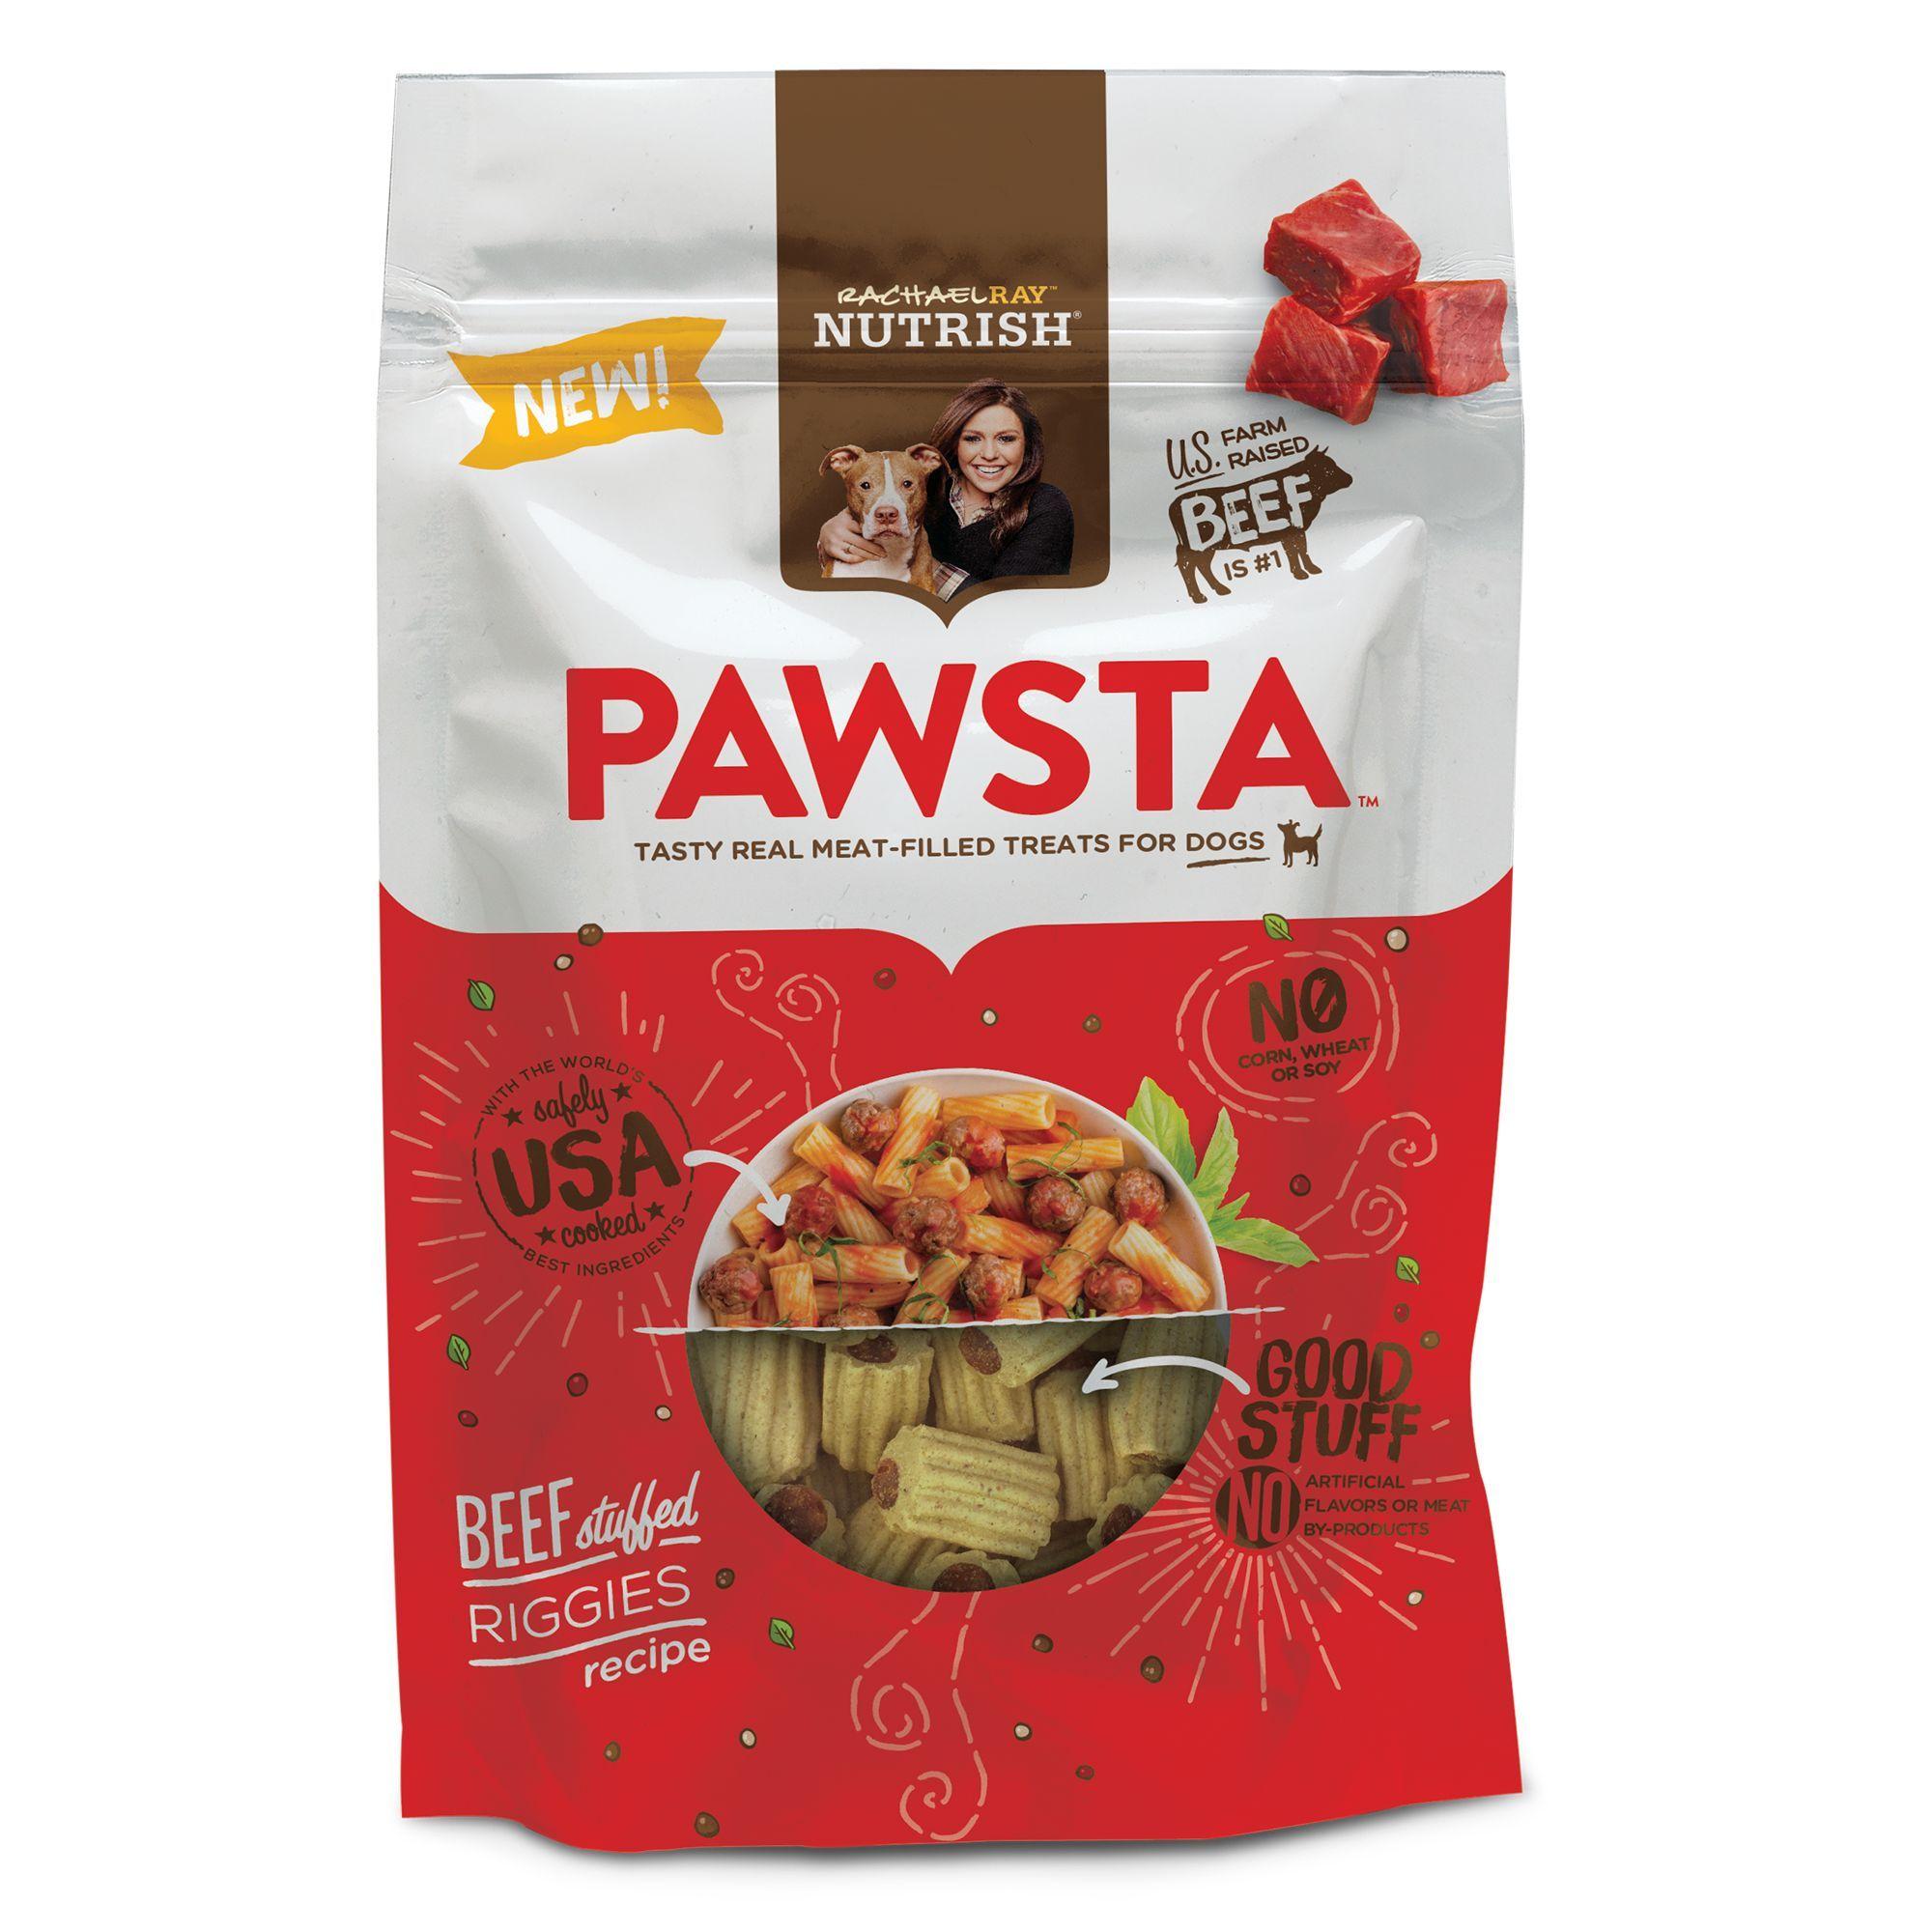 Rachael Ray Nutrish Pawsta Dog Treat Beef Stuffed Riggies